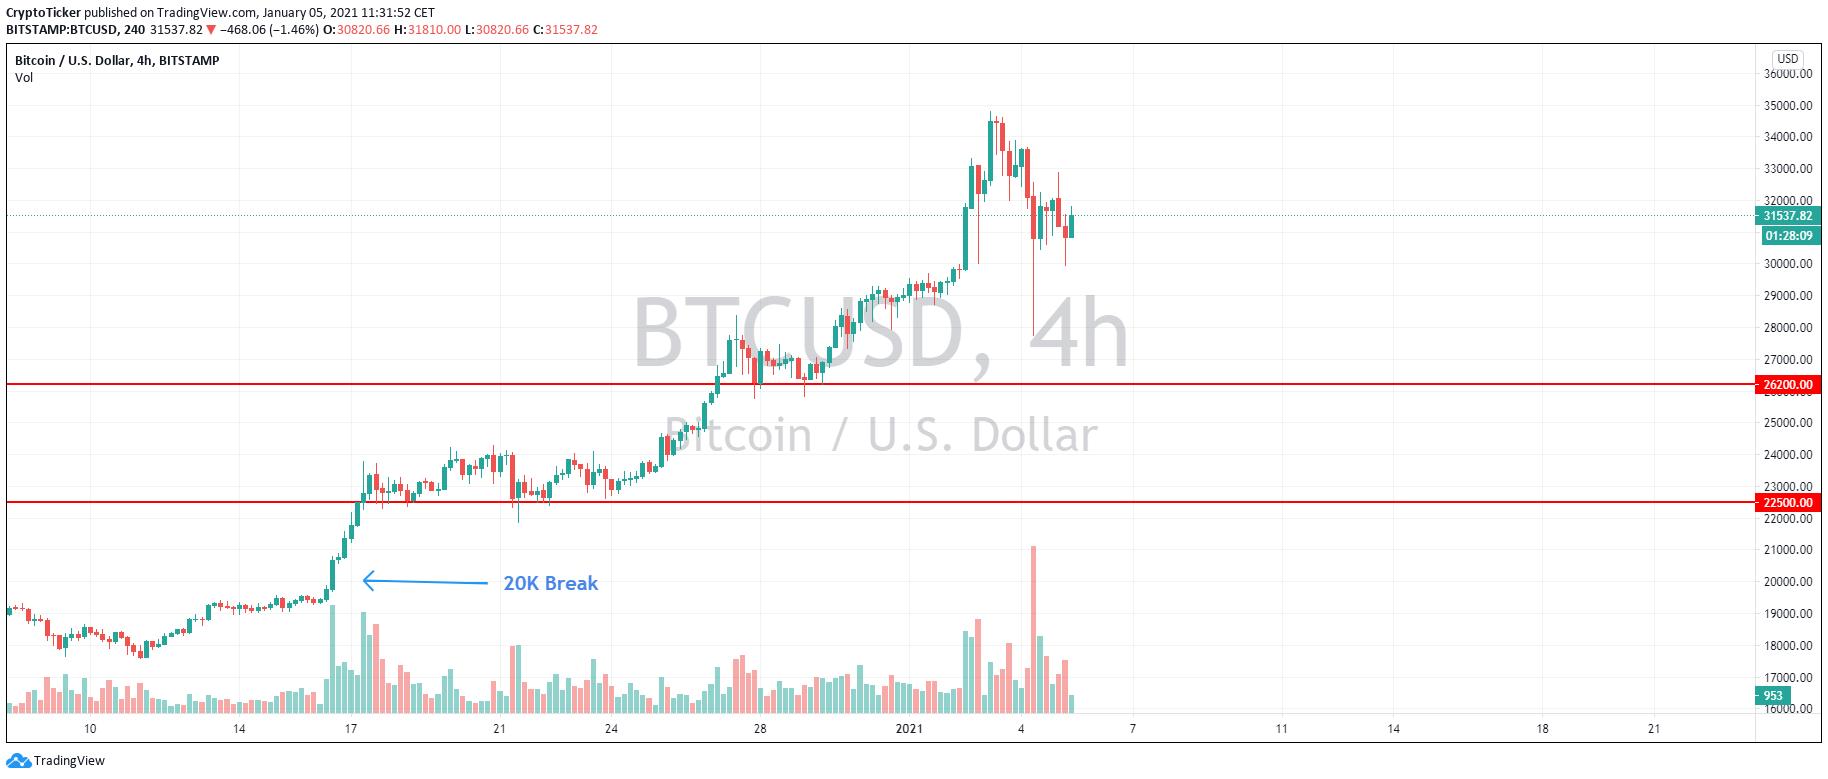 BTC/USD 4-hour chart showing Bitcoin's upwards journey